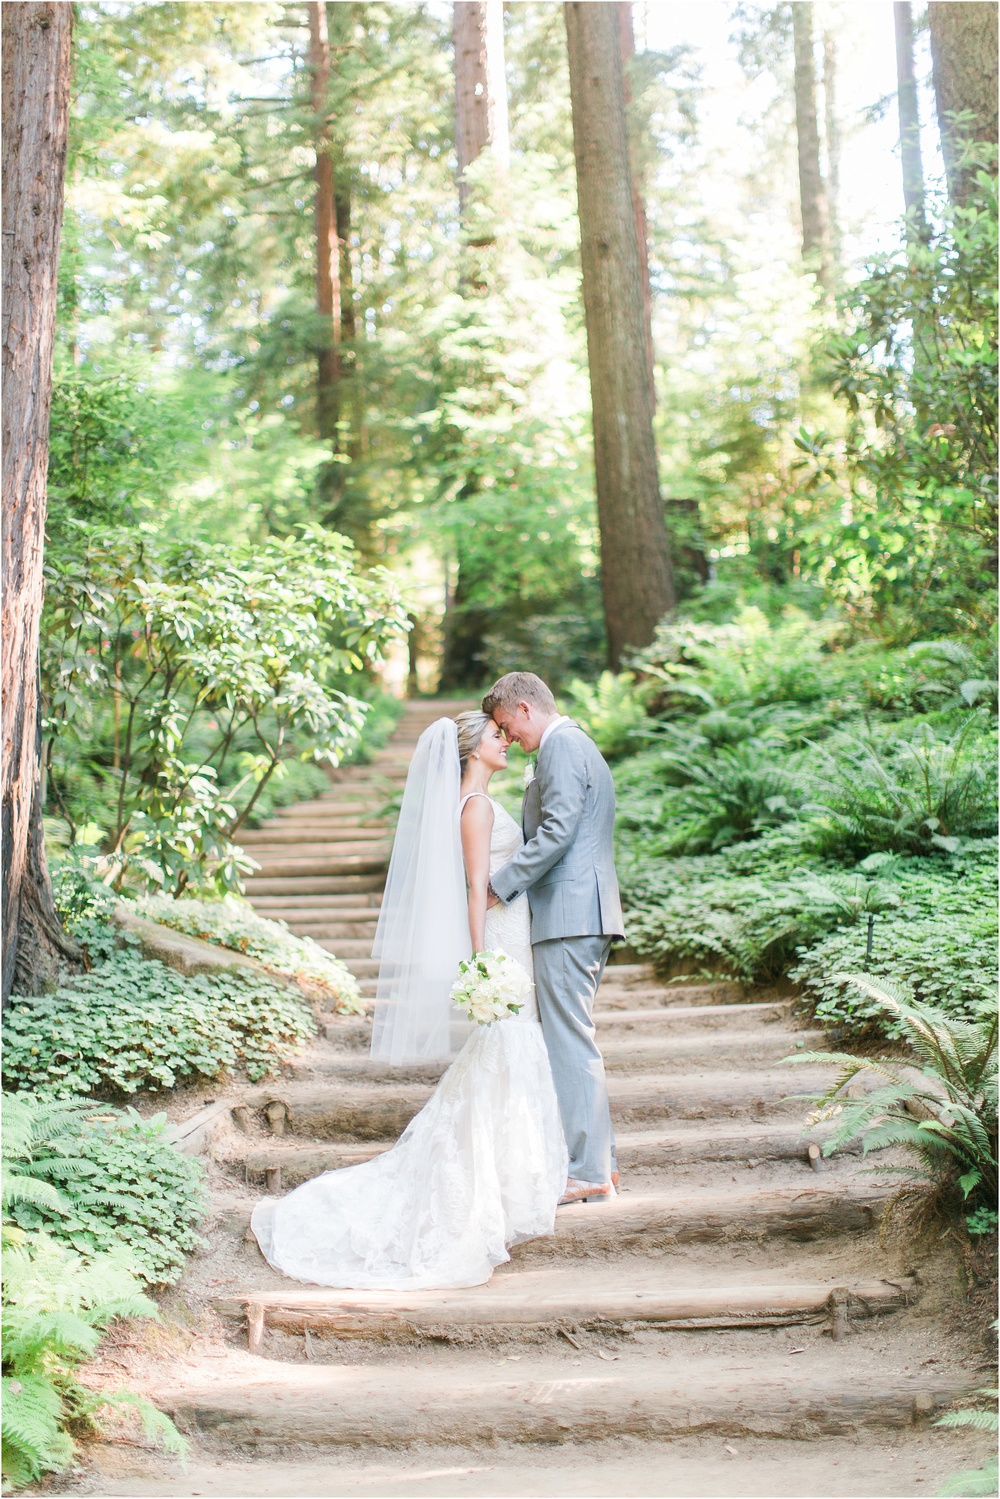 Nestldown_Rustic_Summer_Redwoods_Wedding- 032.jpg